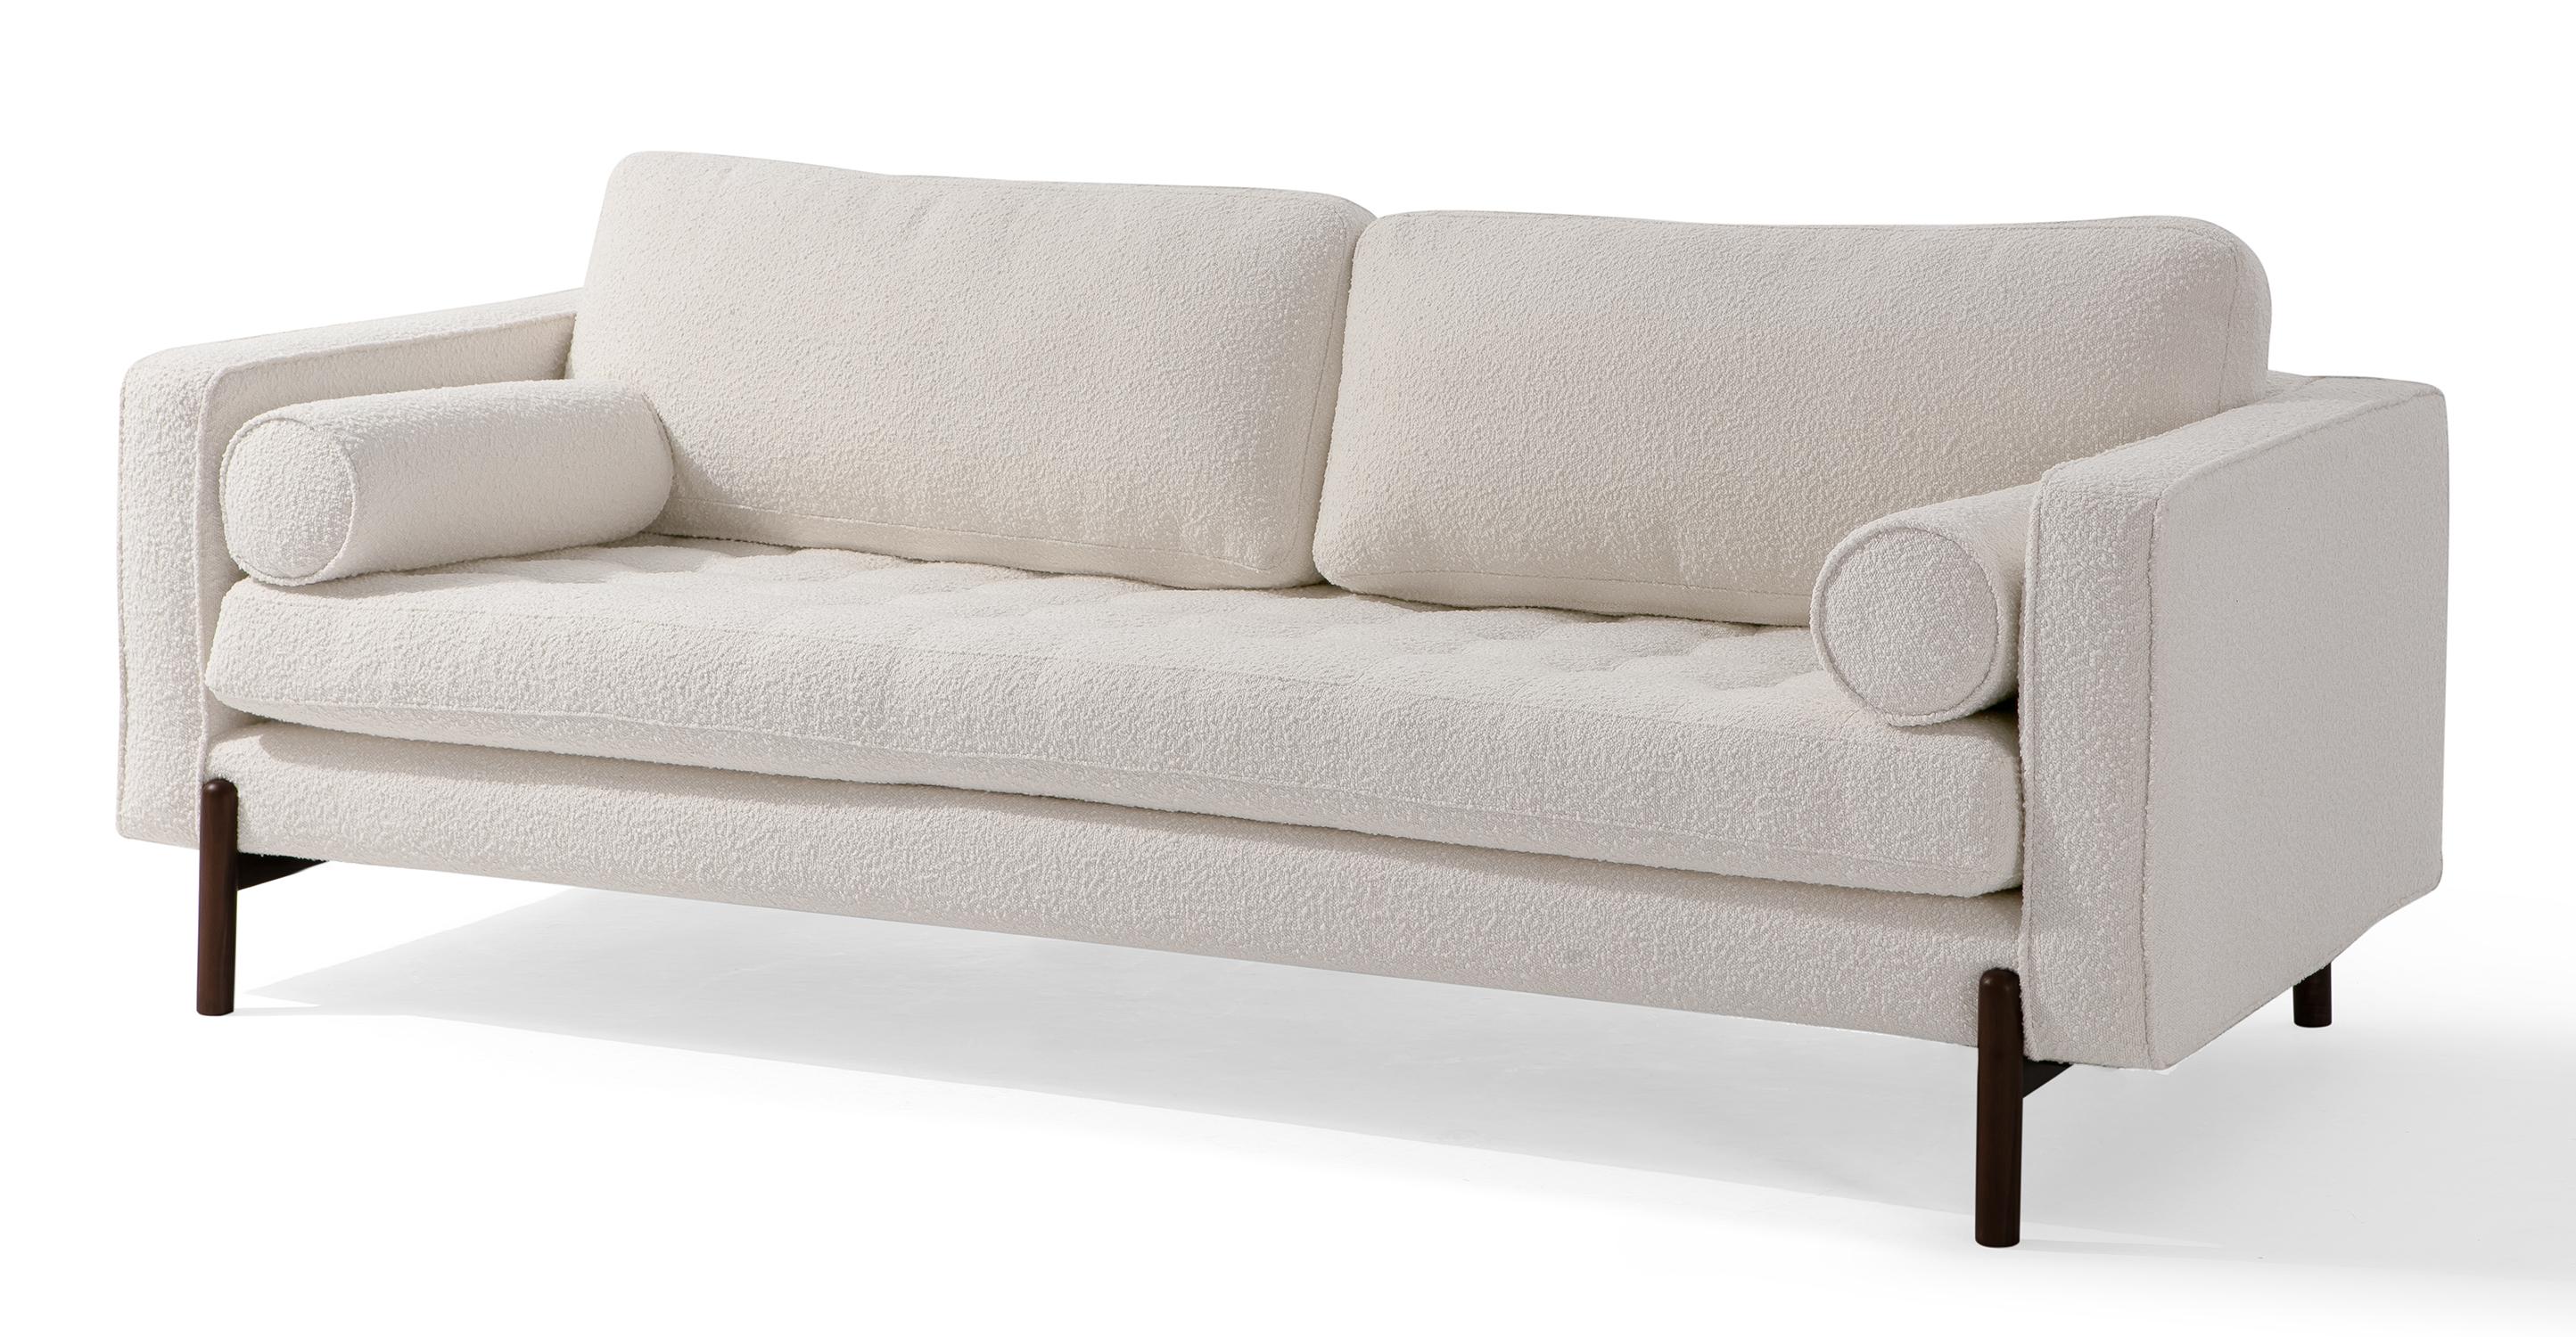 "Dwell 88"" Fabric Sofa, Blanc Boucle"